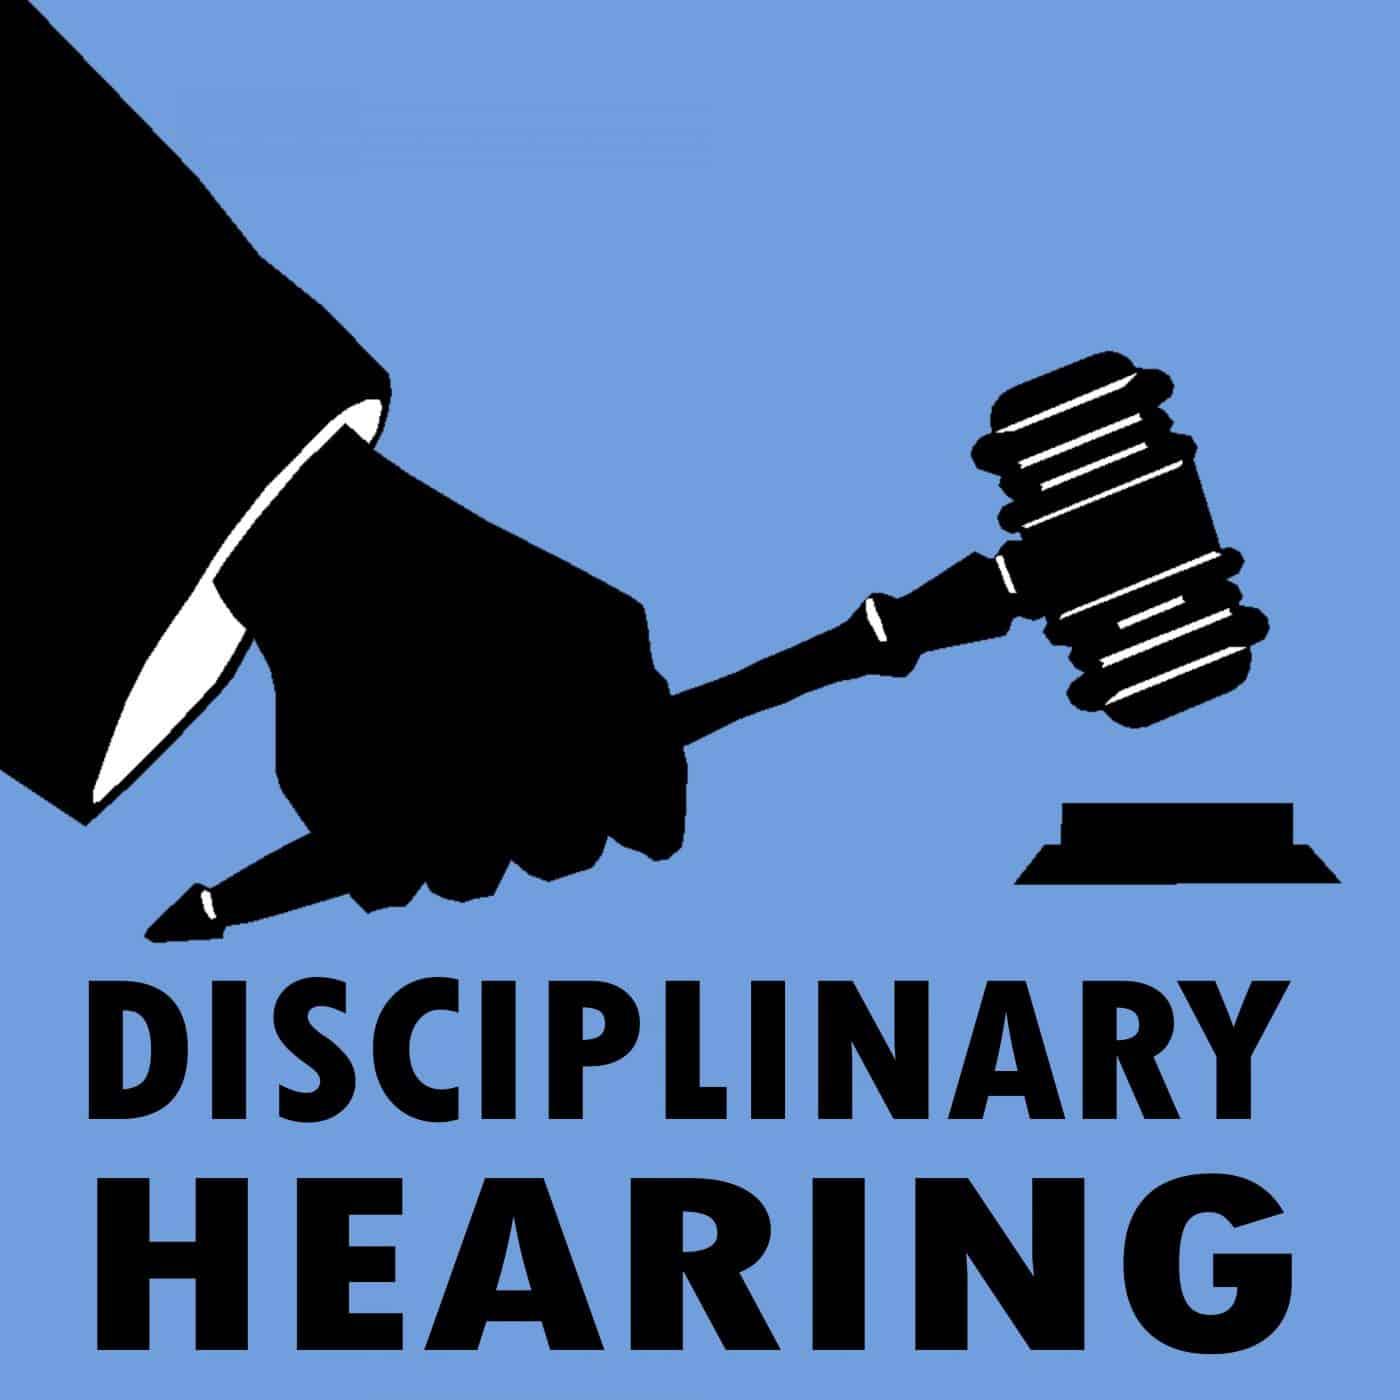 Disciplinary Procedures Image